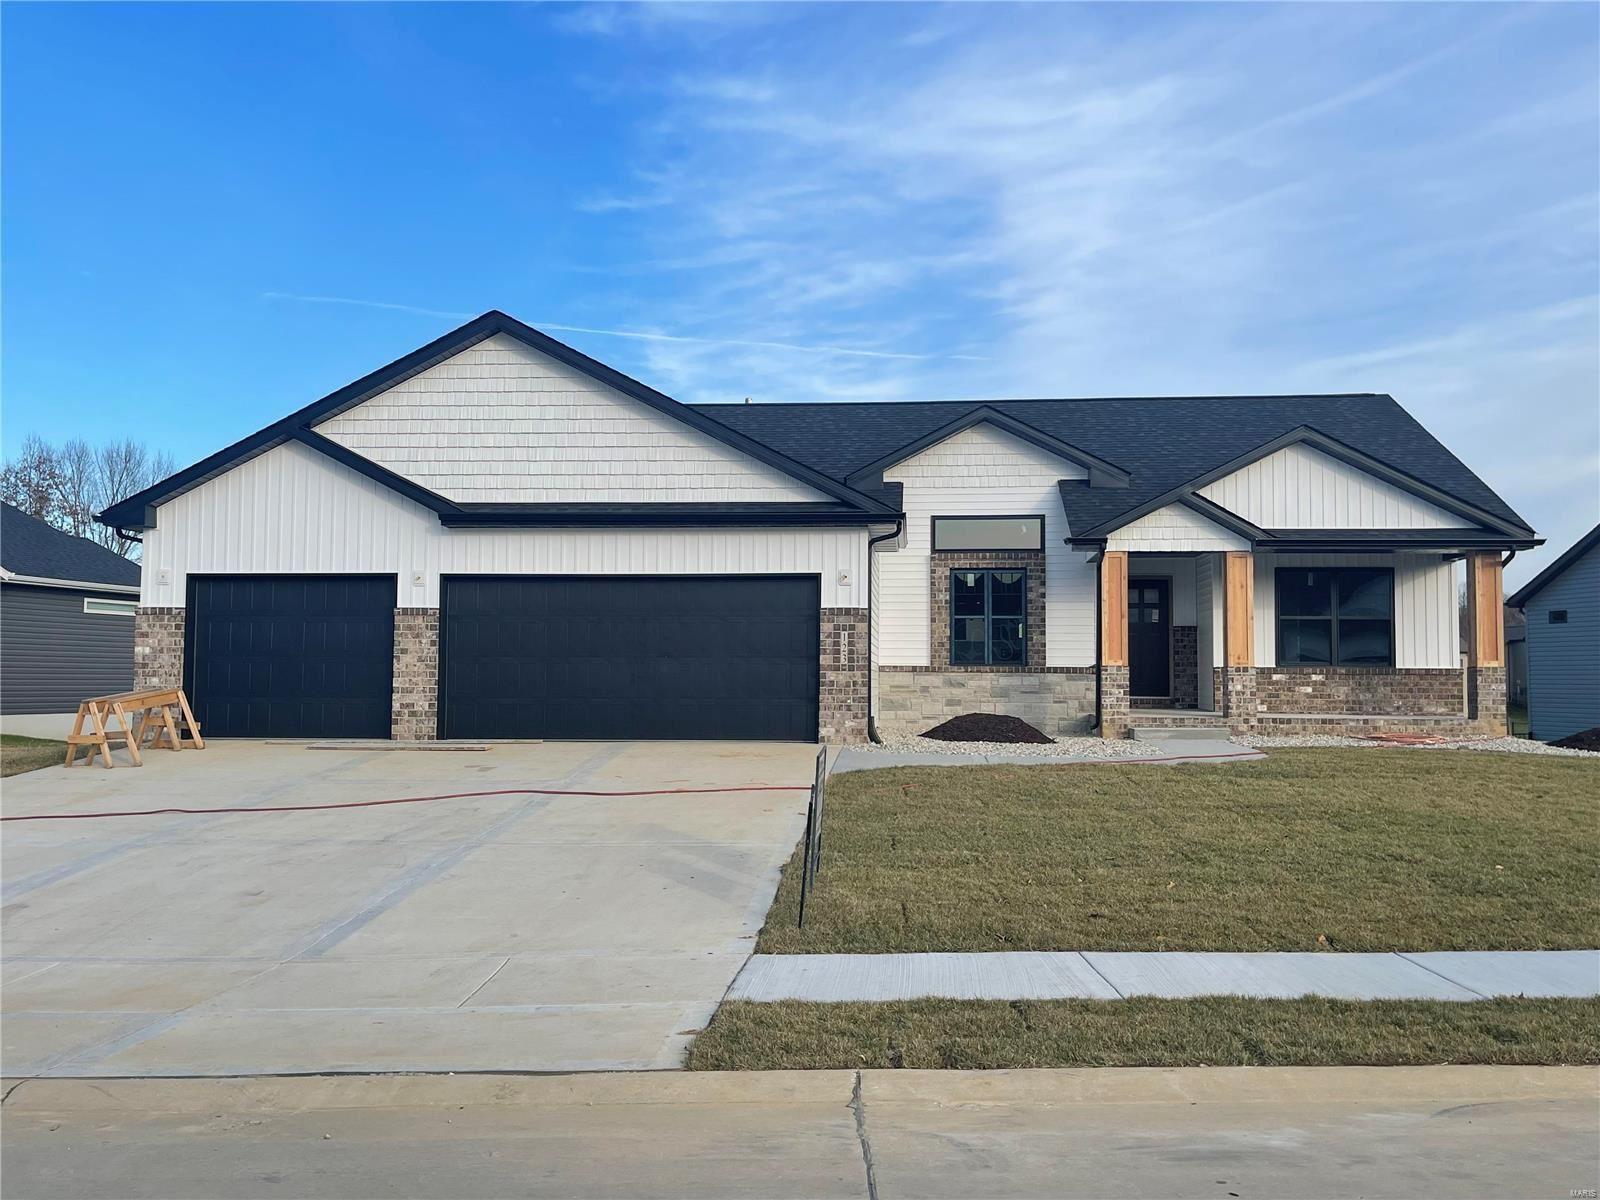 123 Timber Terrace N, Troy, IL 62294 - MLS#: 21068172